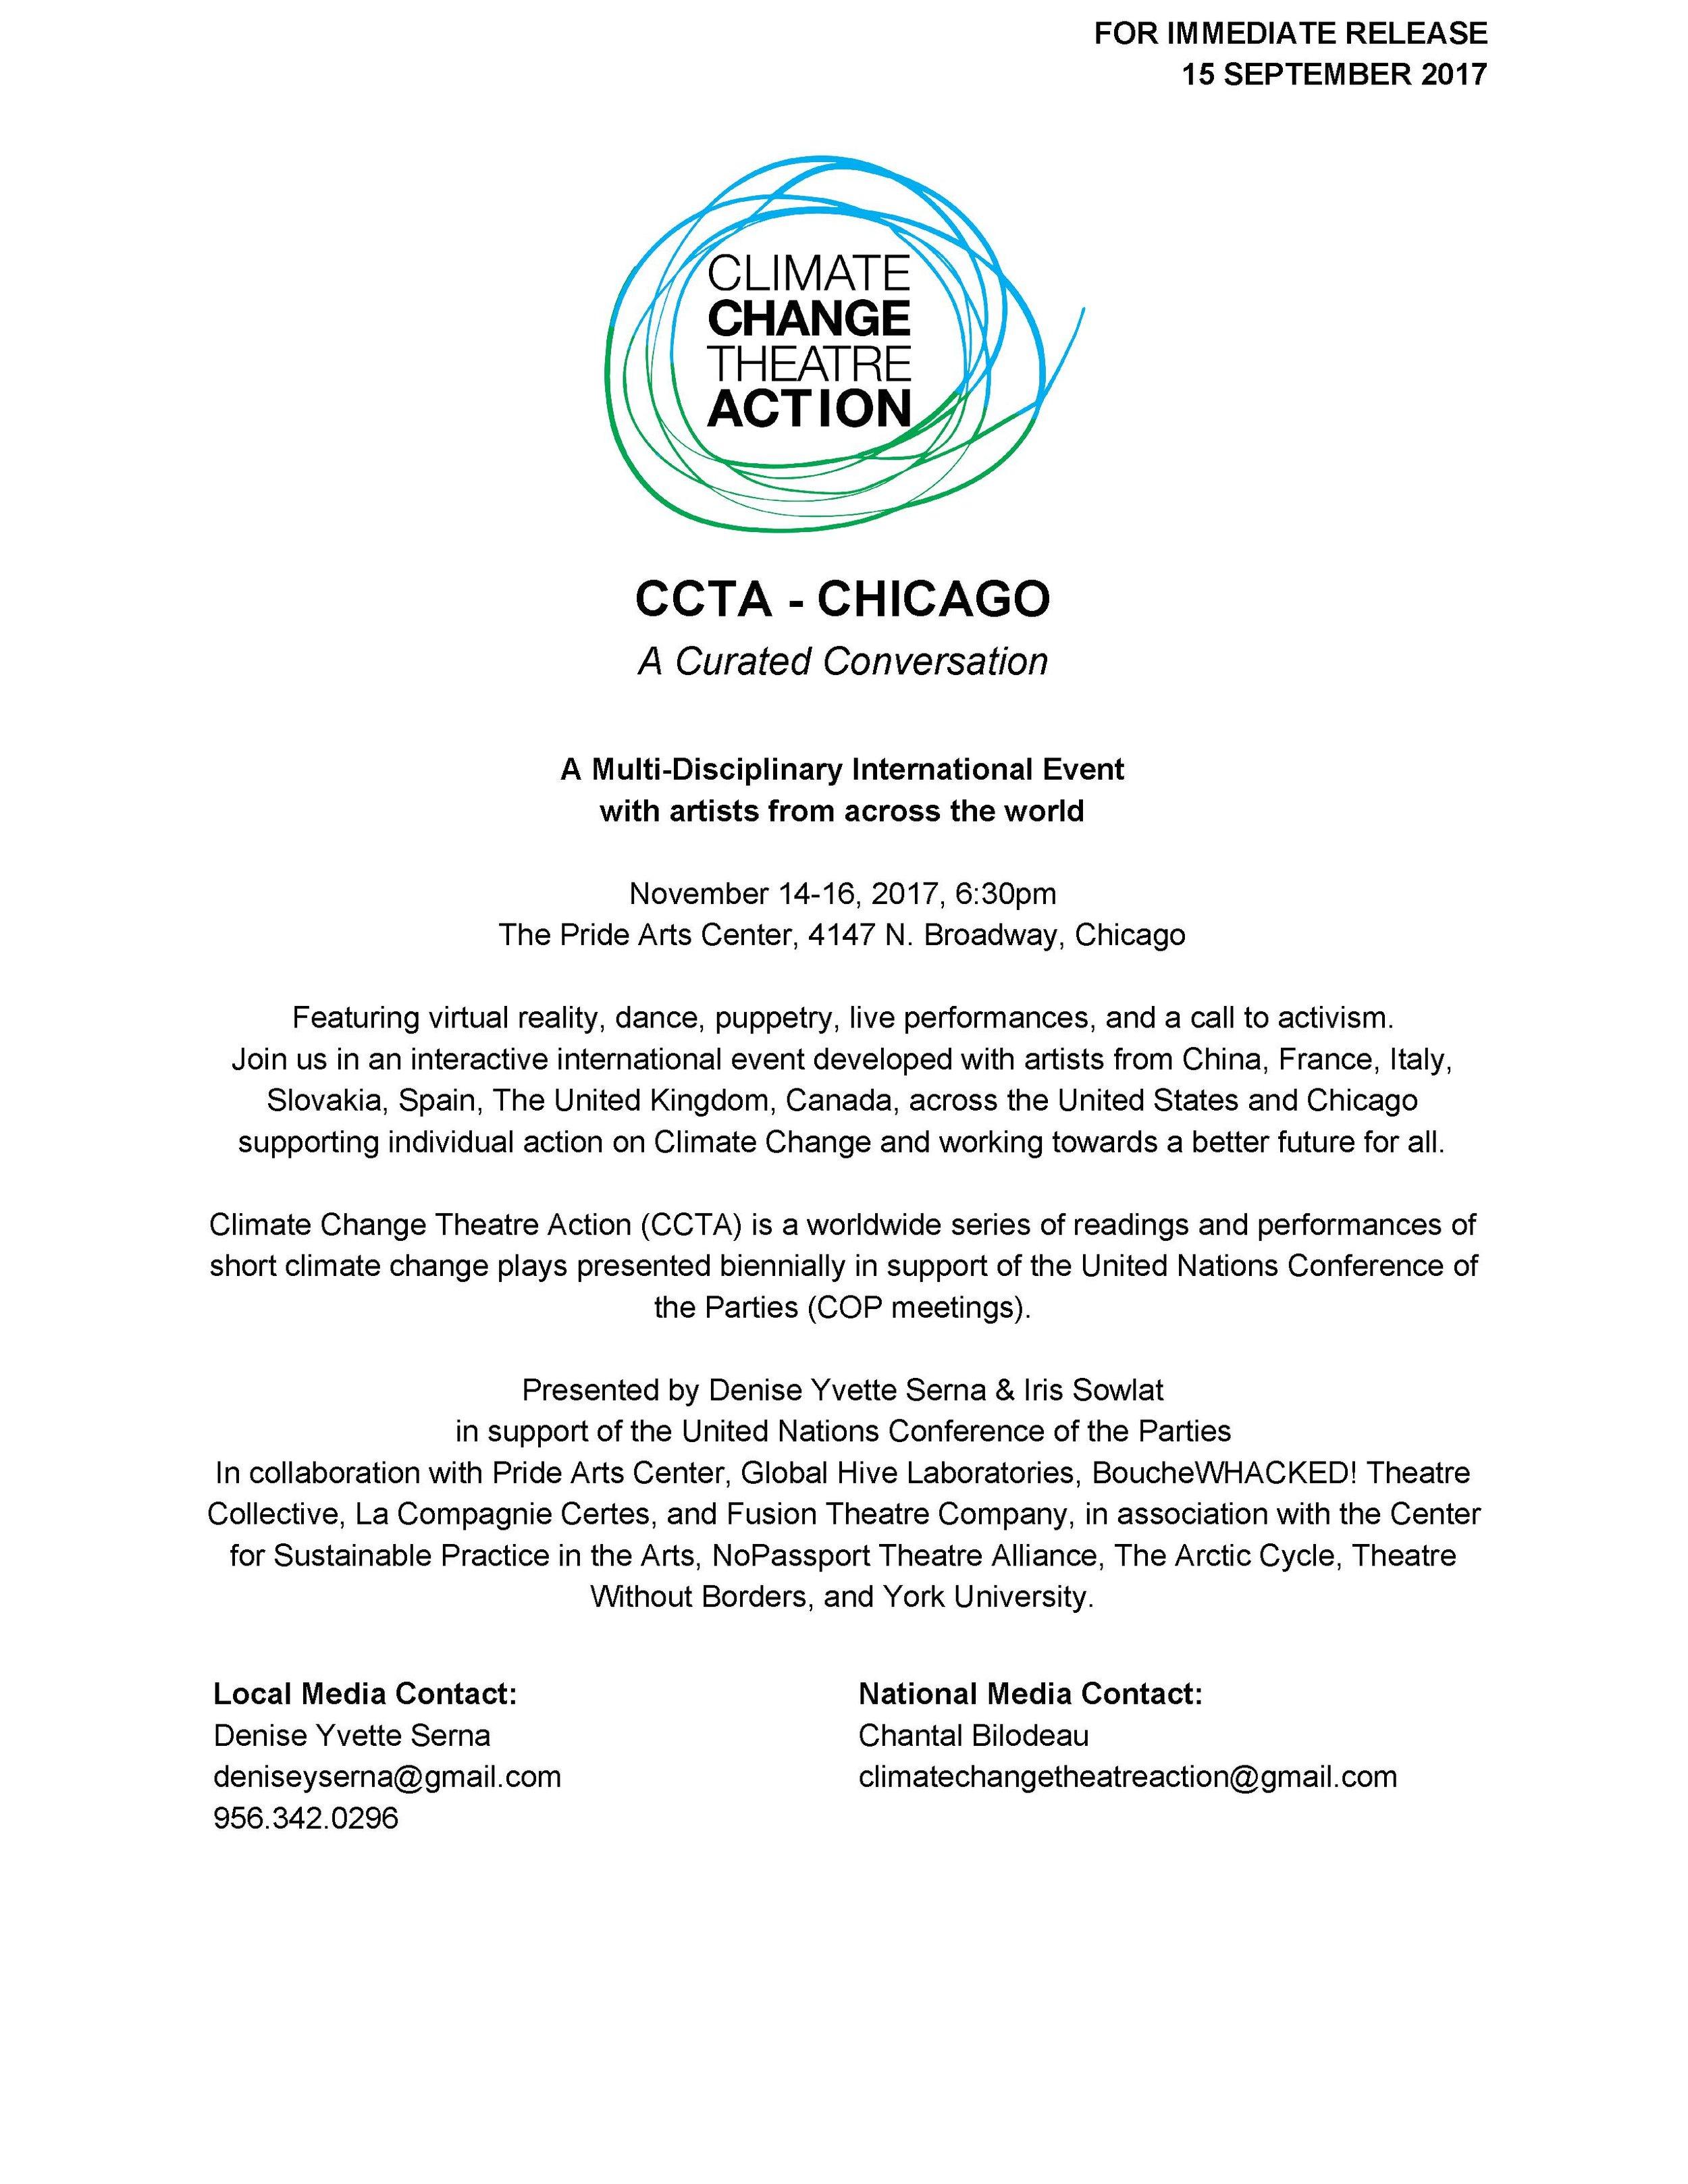 CCTA - 9.15.2017 - 1 PAGE Press Release.jpg